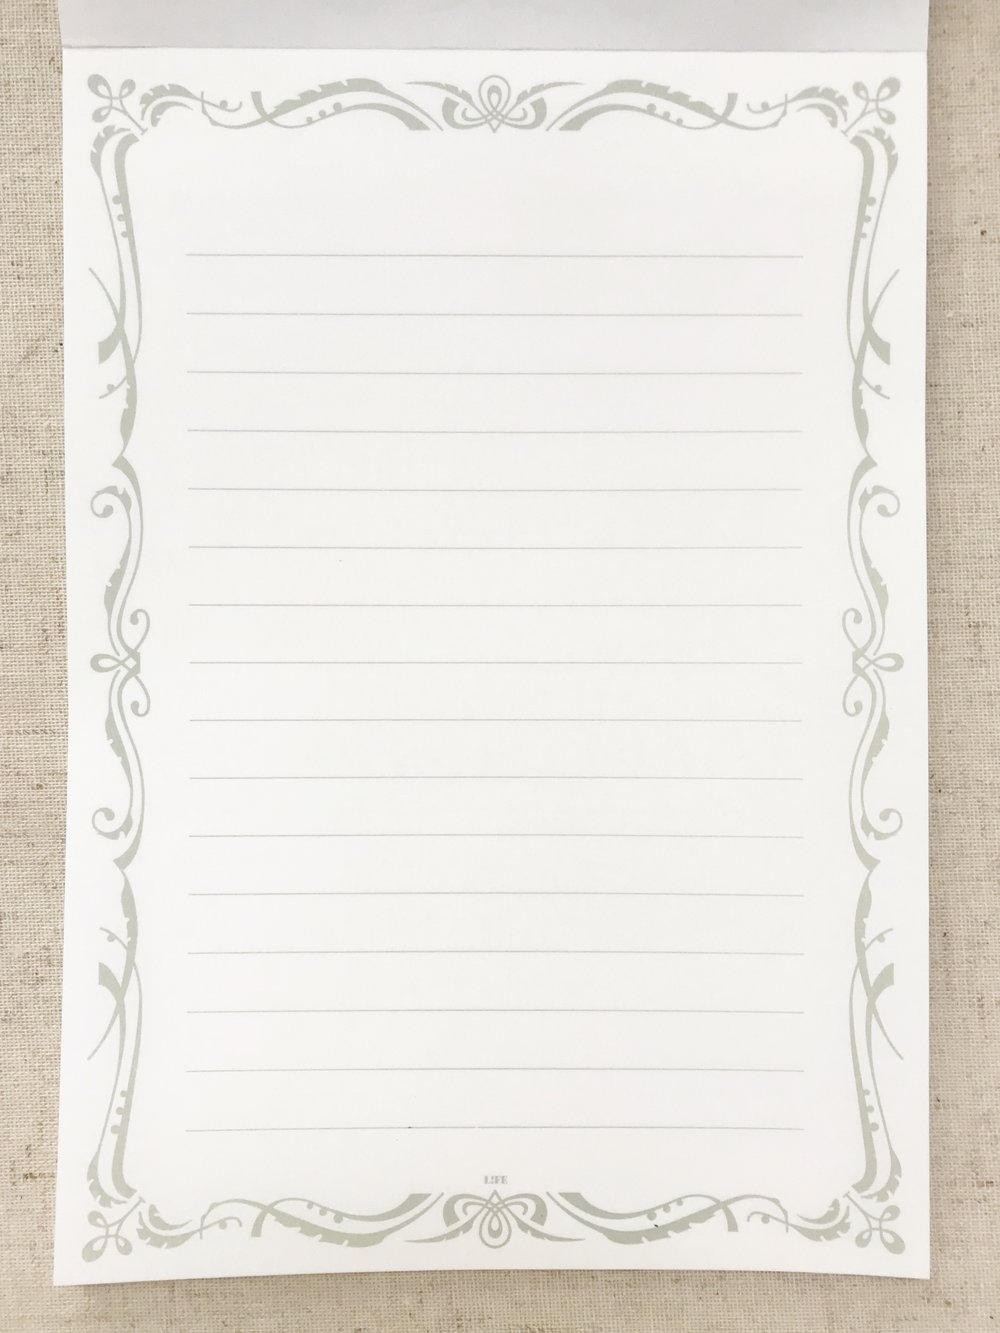 life-co-white-writing-4.JPG